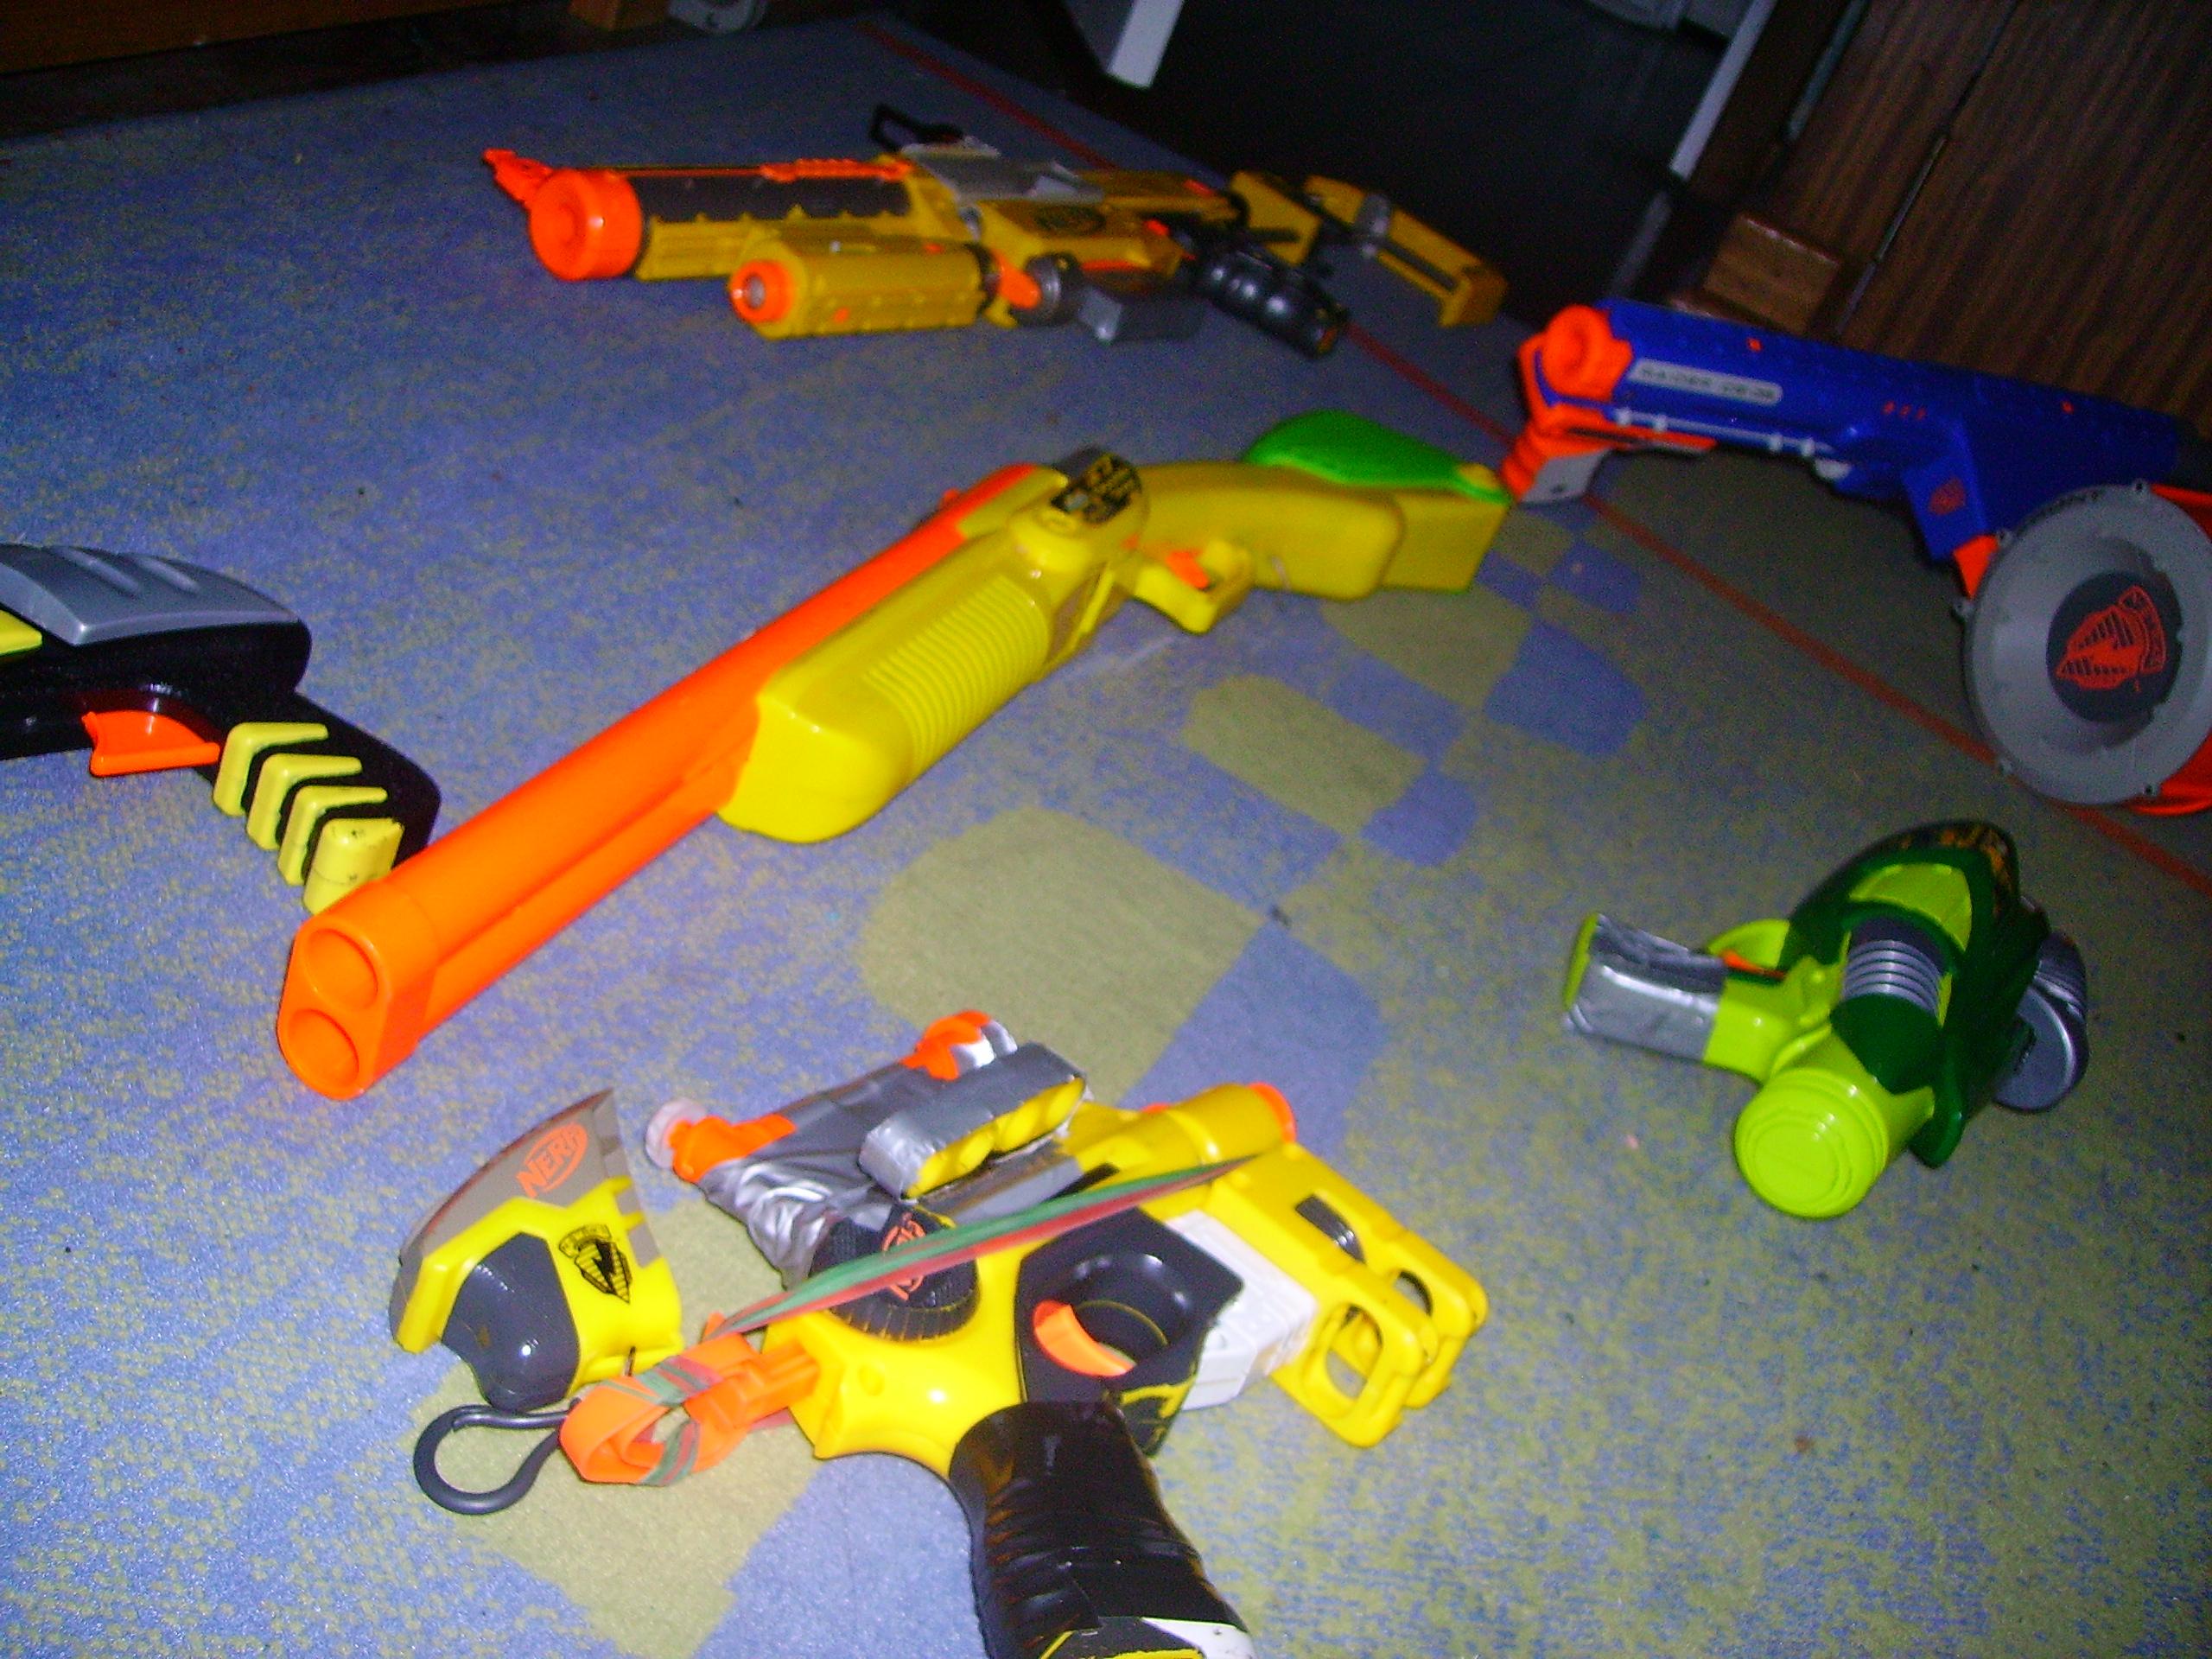 Great Nerf War tactics and skills